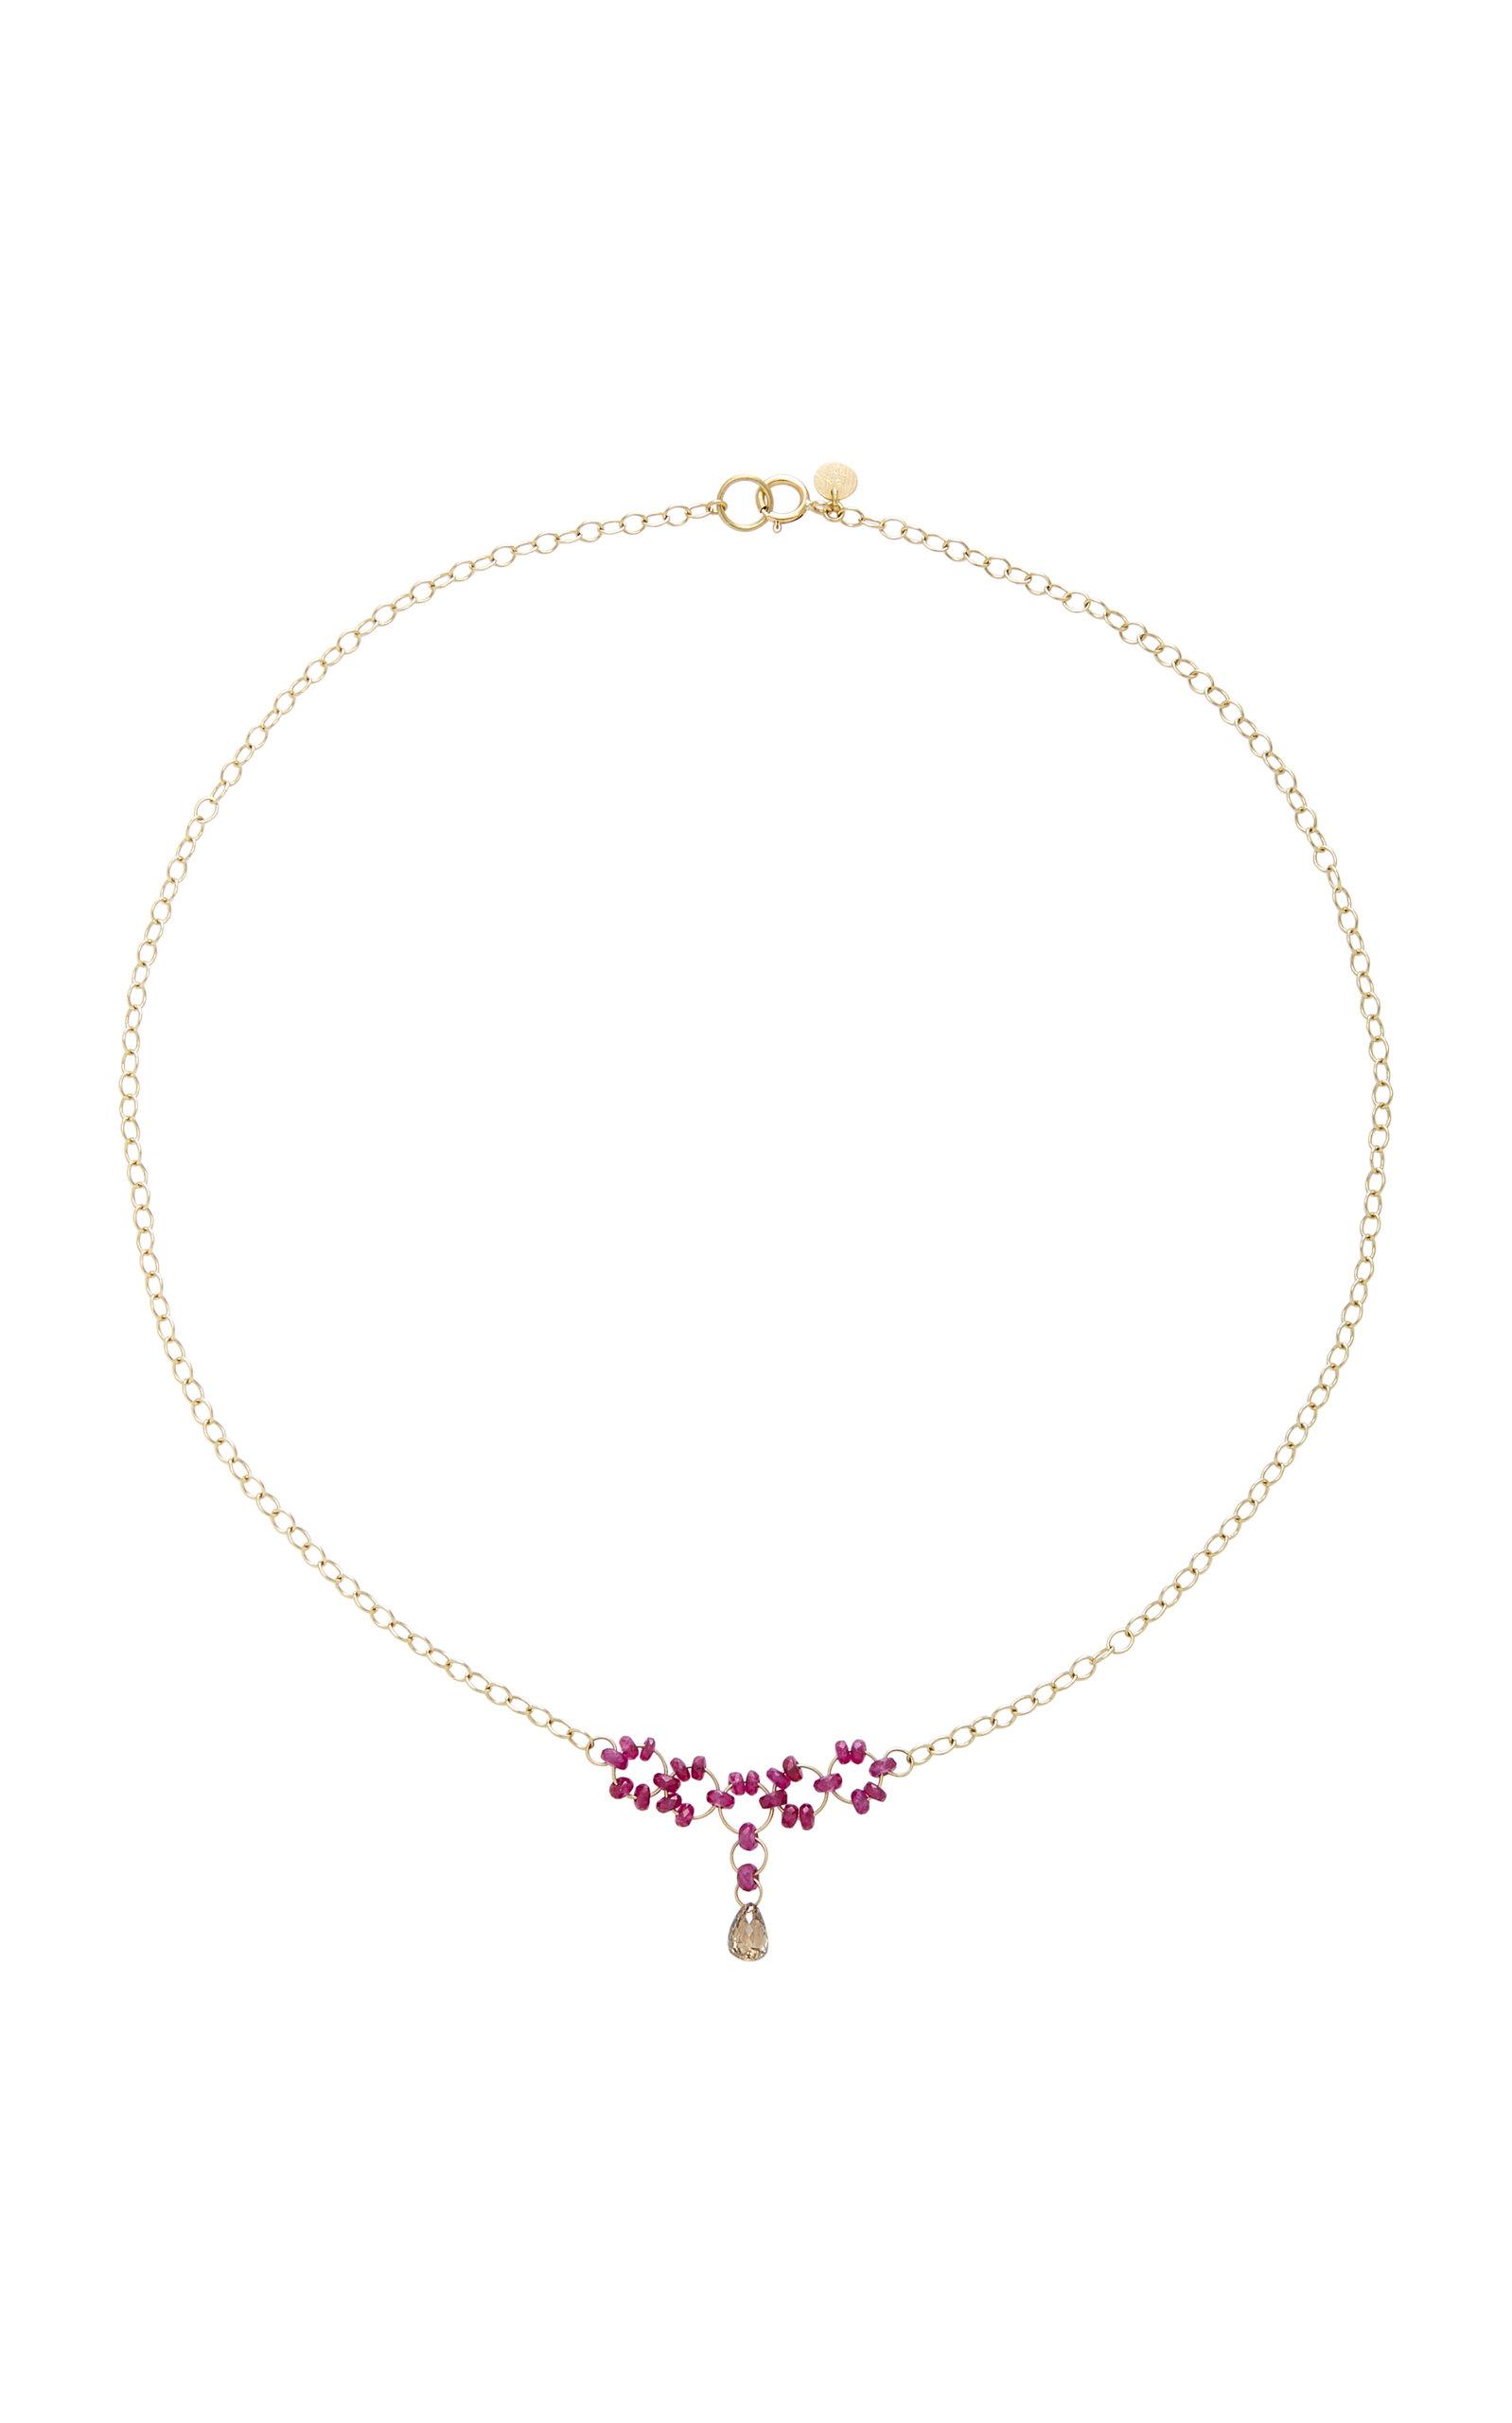 Petite Trestle 18K Gold Ruby and Diamond Briollete Necklace Mallary Marks niZA8GUD